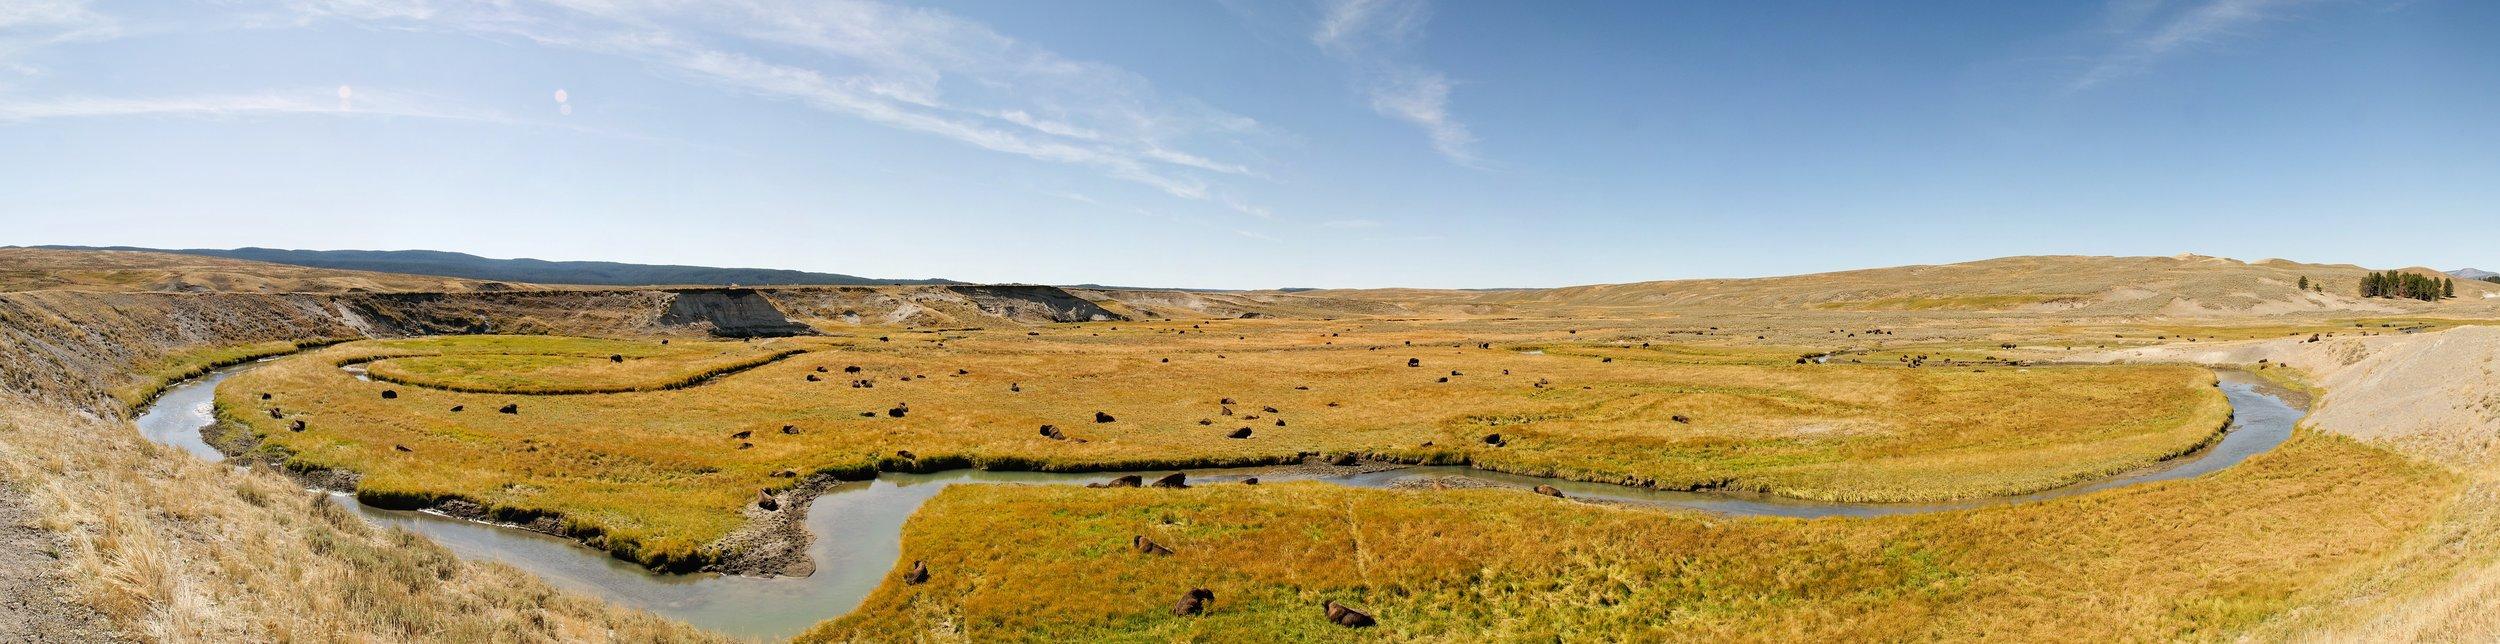 "hayden valley panorama 1   up to 18"" x 70""  2008"